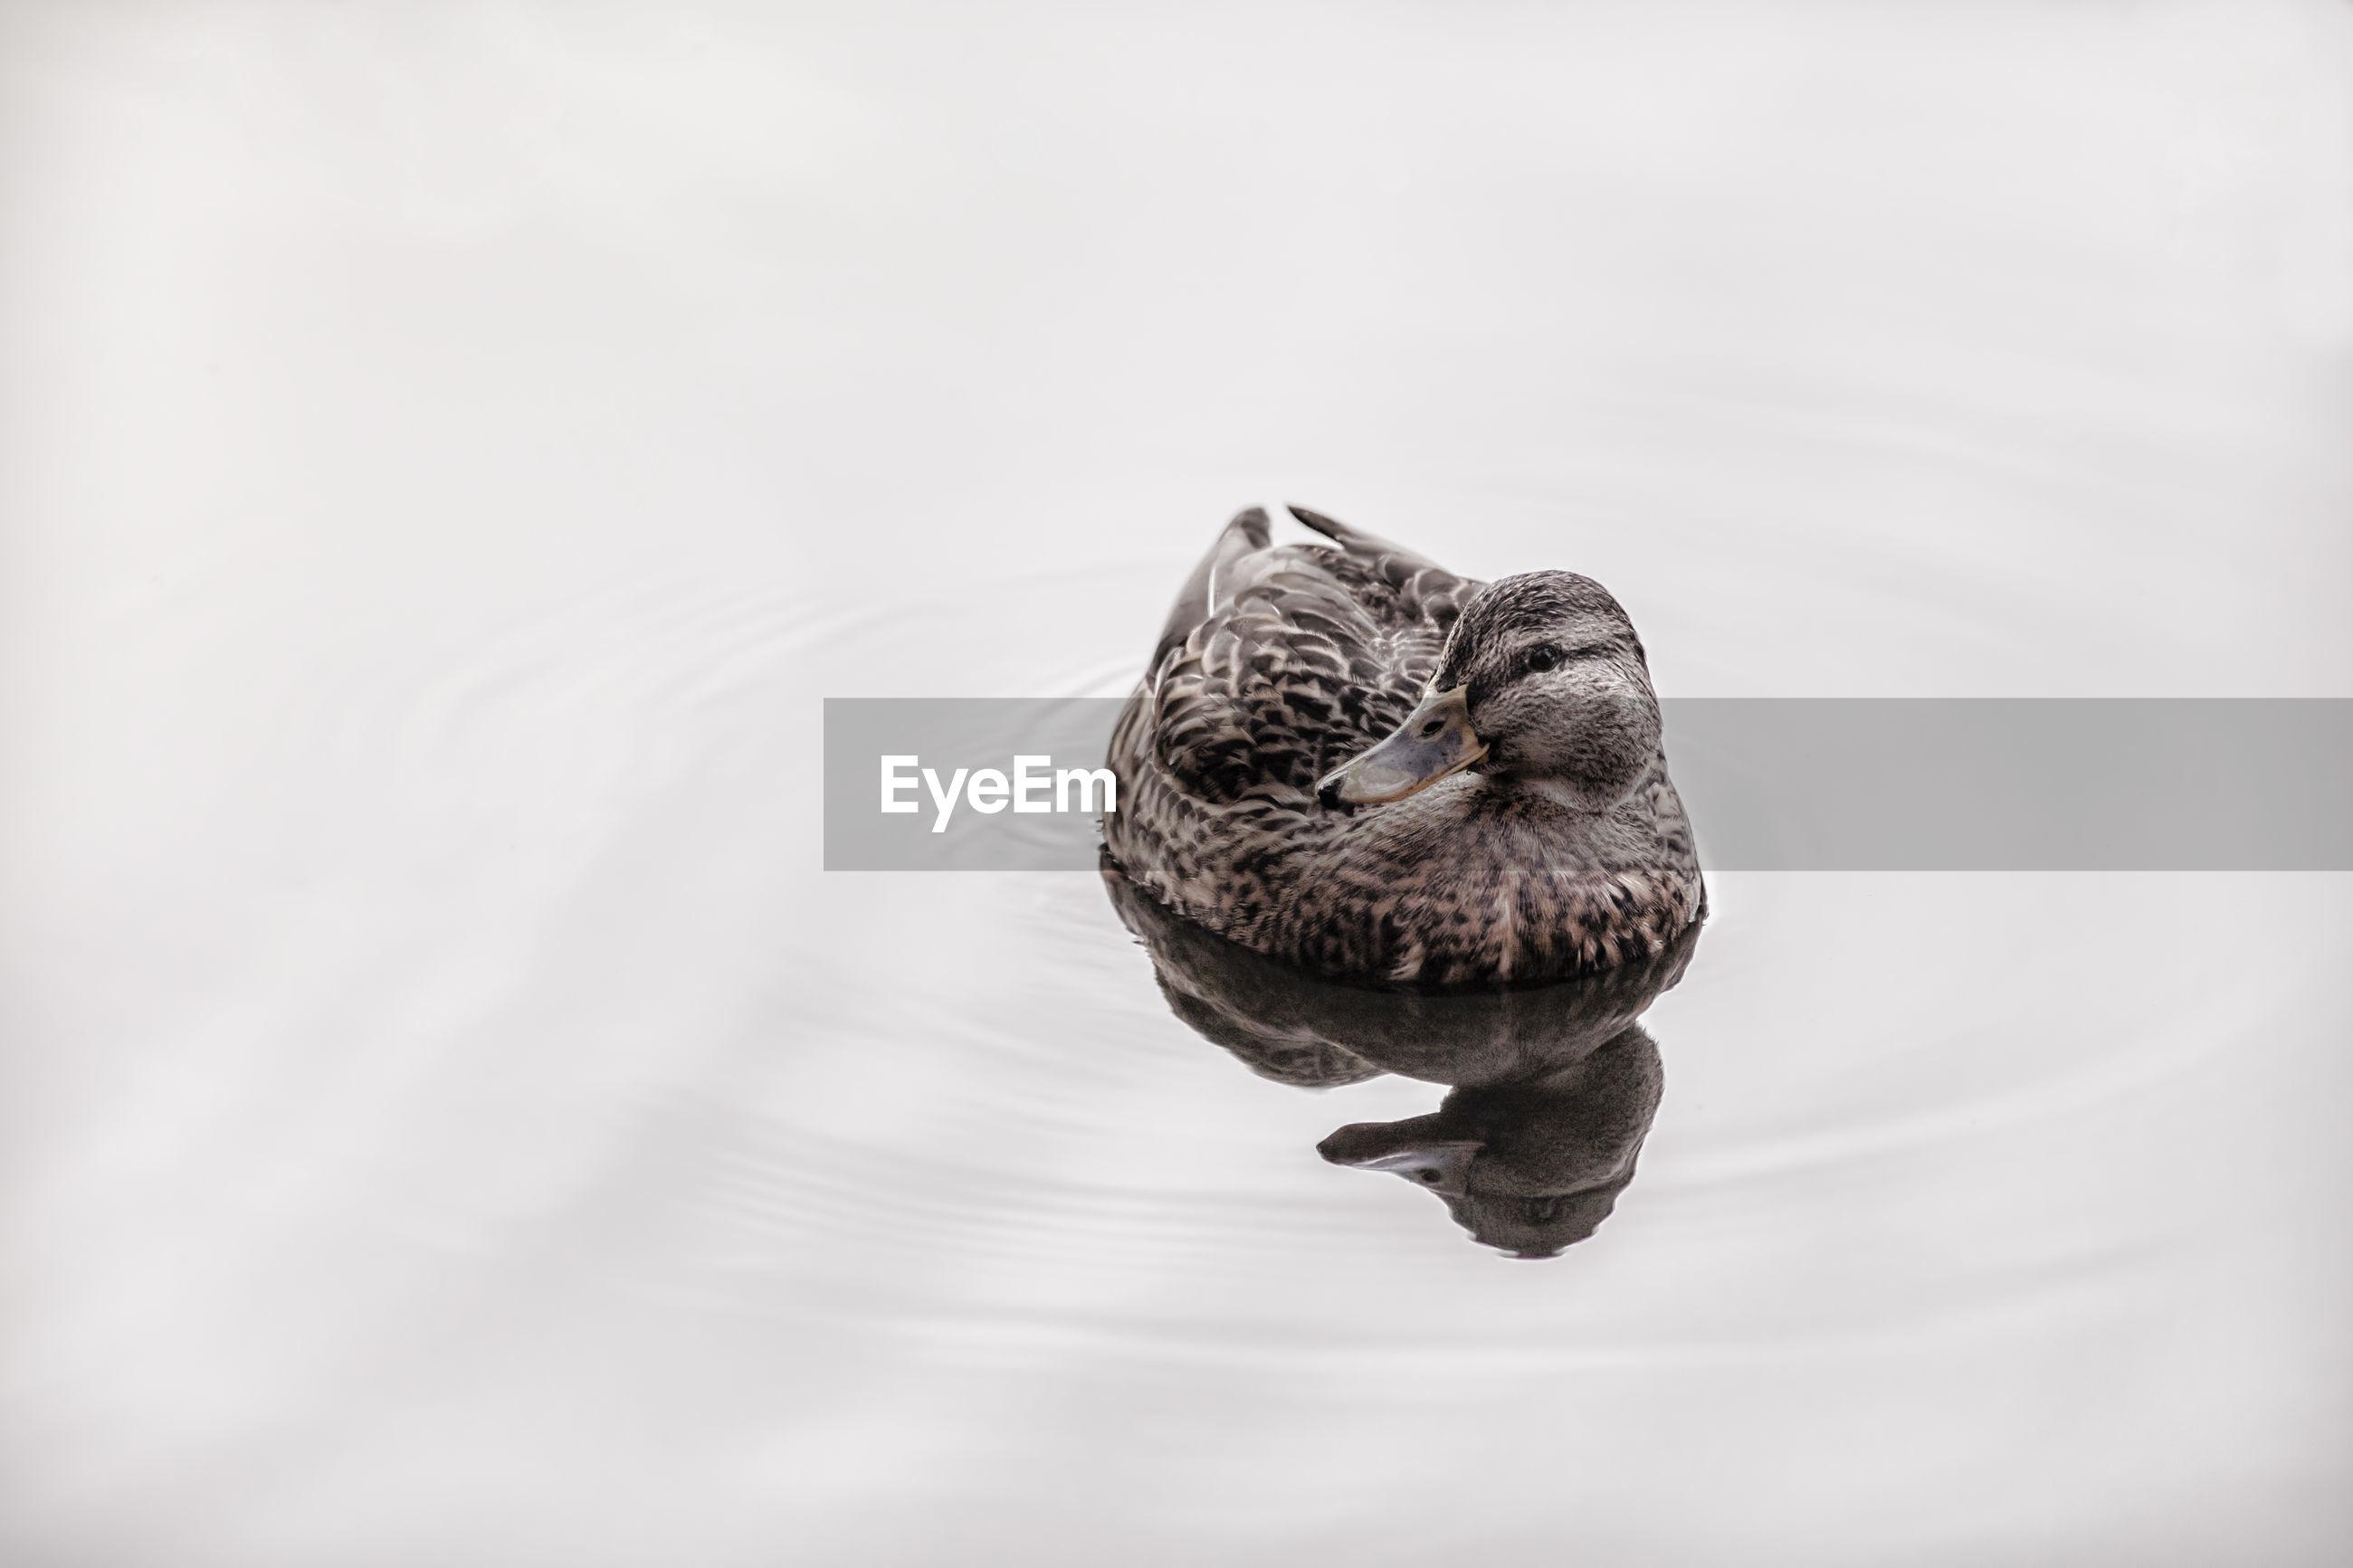 CLOSE-UP OF TURTLE SWIMMING ON LAKE